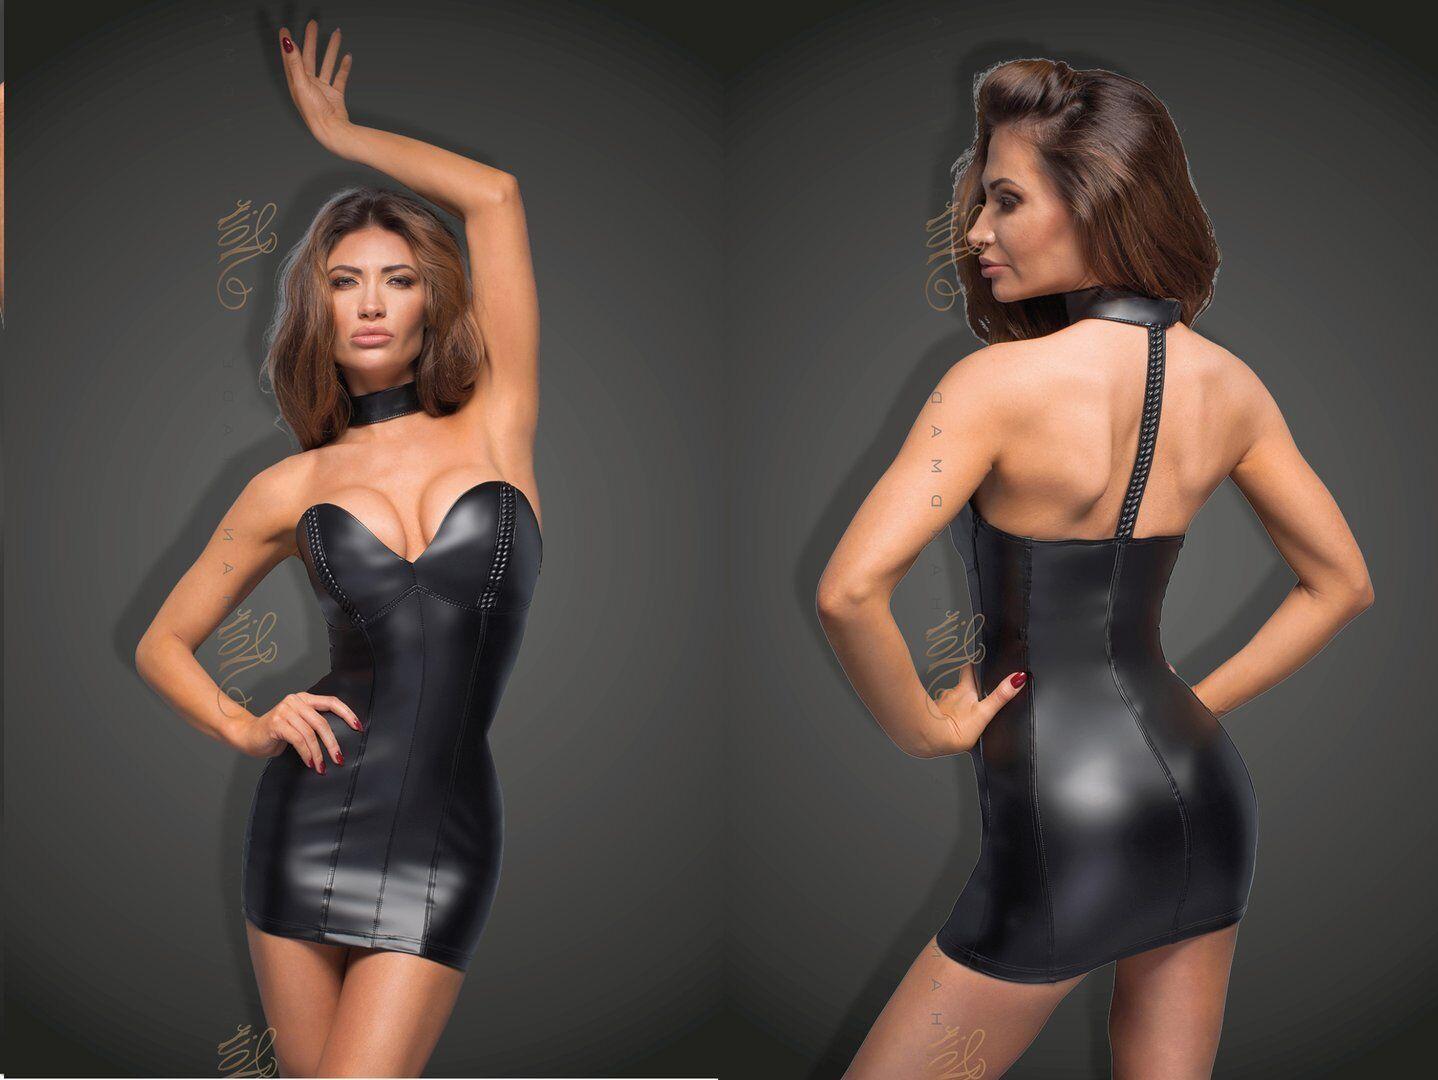 schwarz HANDMADE POWERWETLOOK KLEID minikleid wetlook schwarz kunstleder clubwear